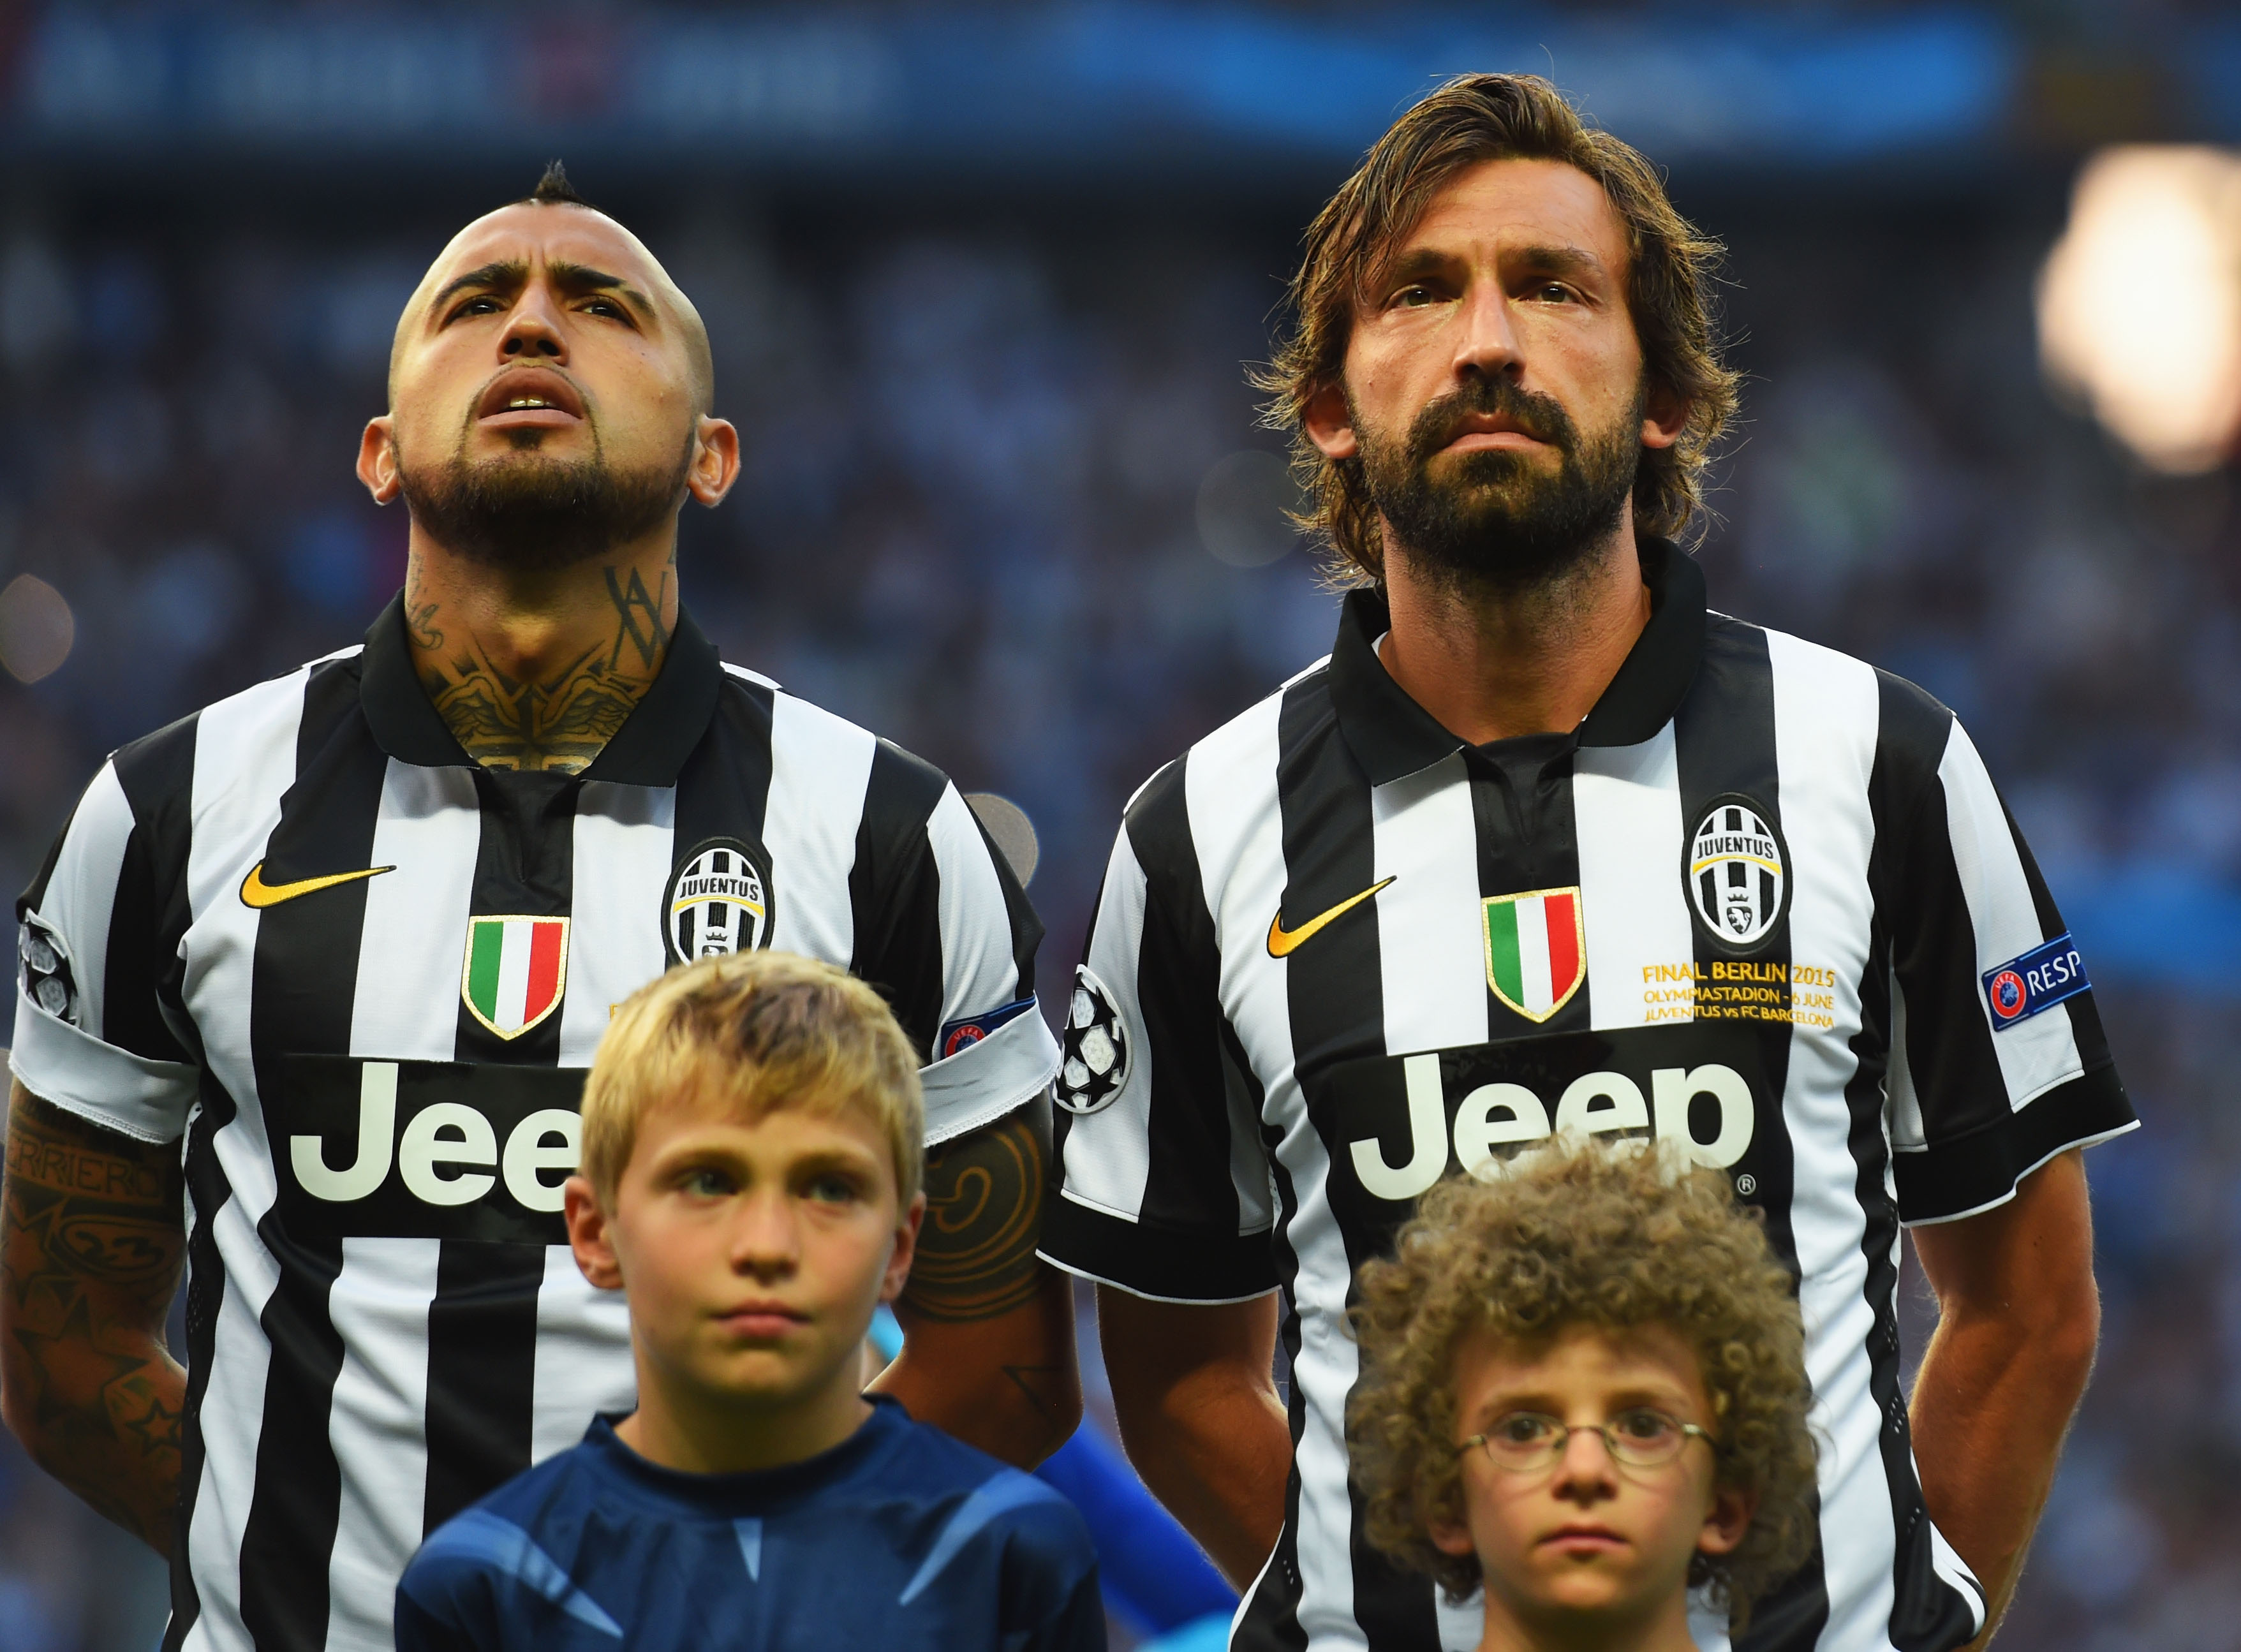 Juventus V Fc Barcelona Uefa Champions League Final Juvefc Comjuvefc Com